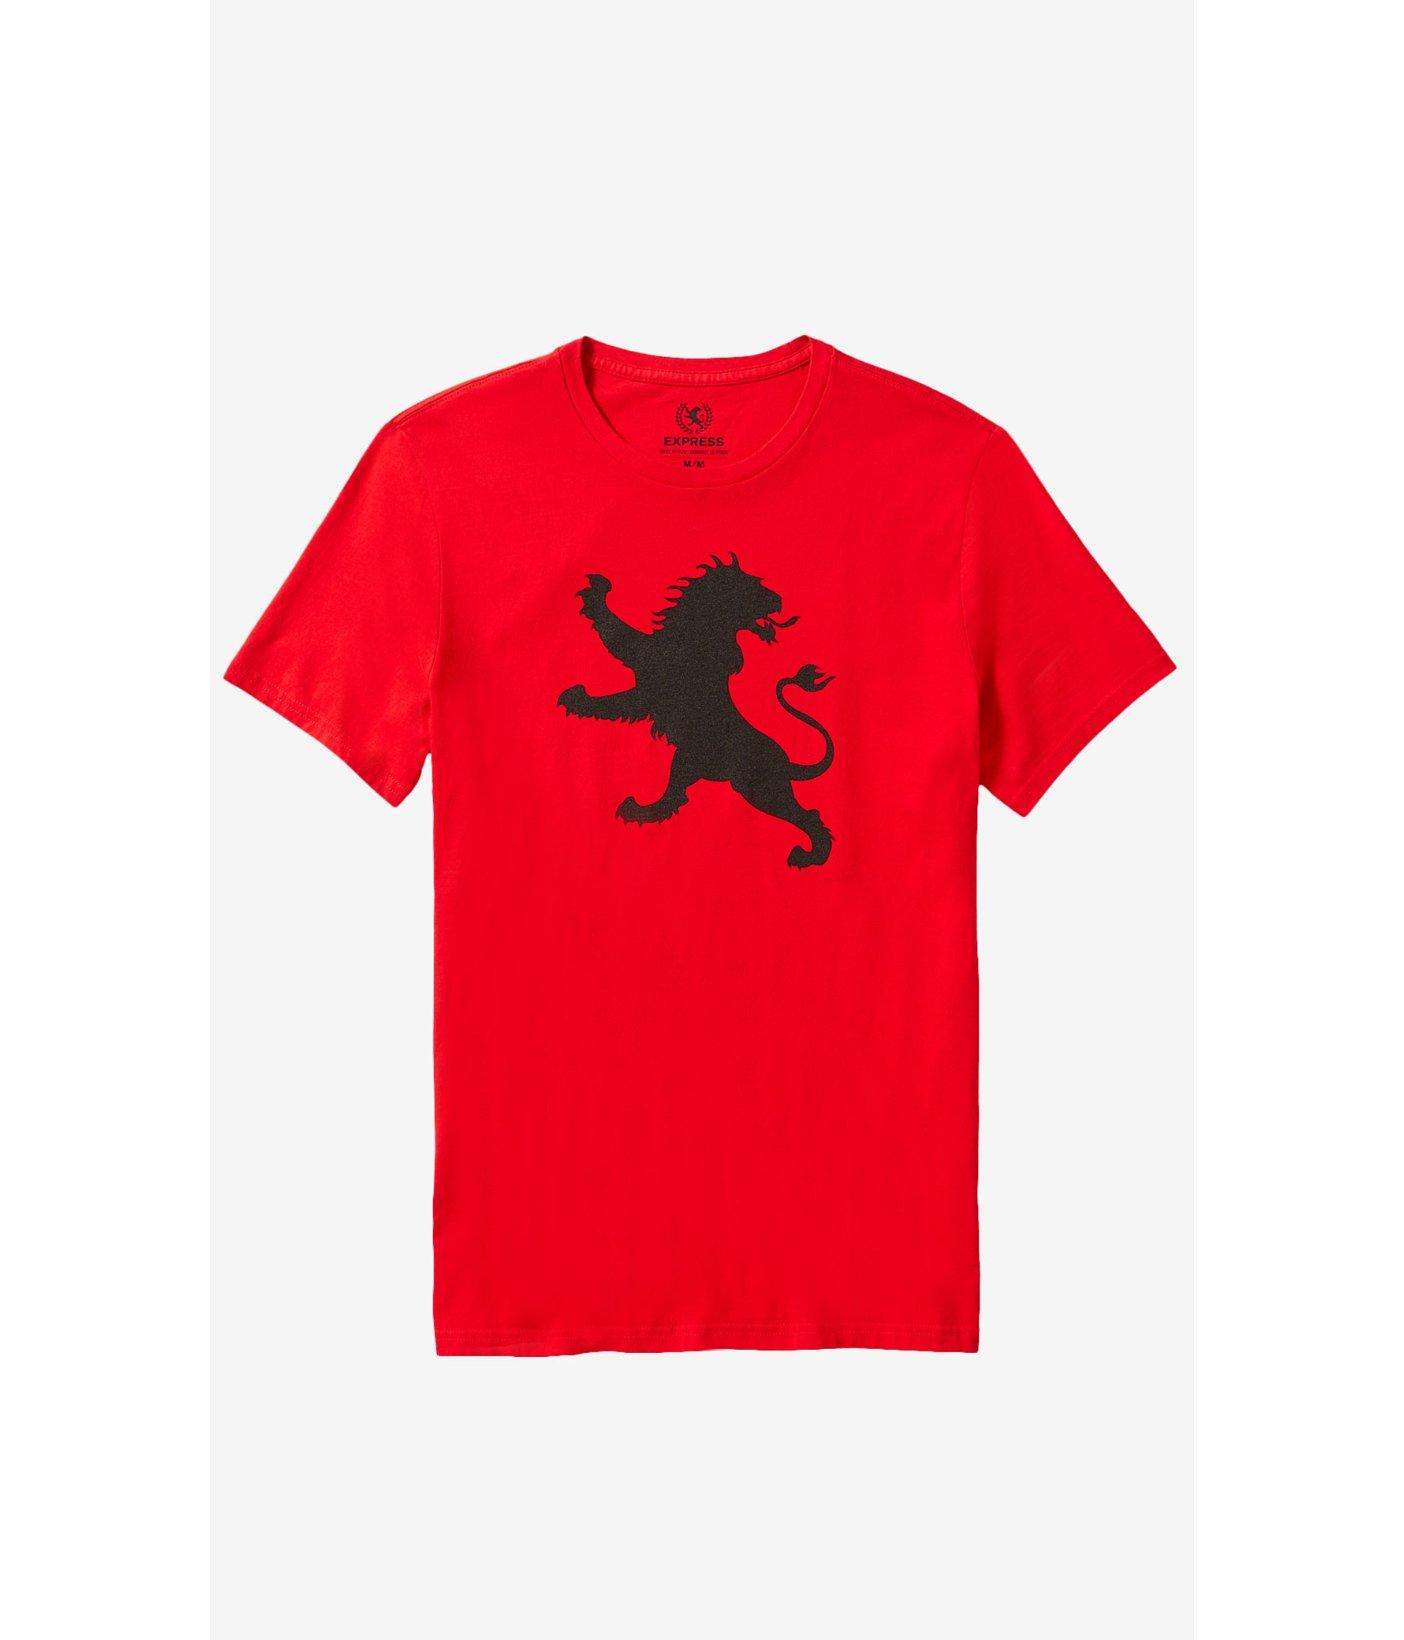 Burberry Tee Shirt Womens